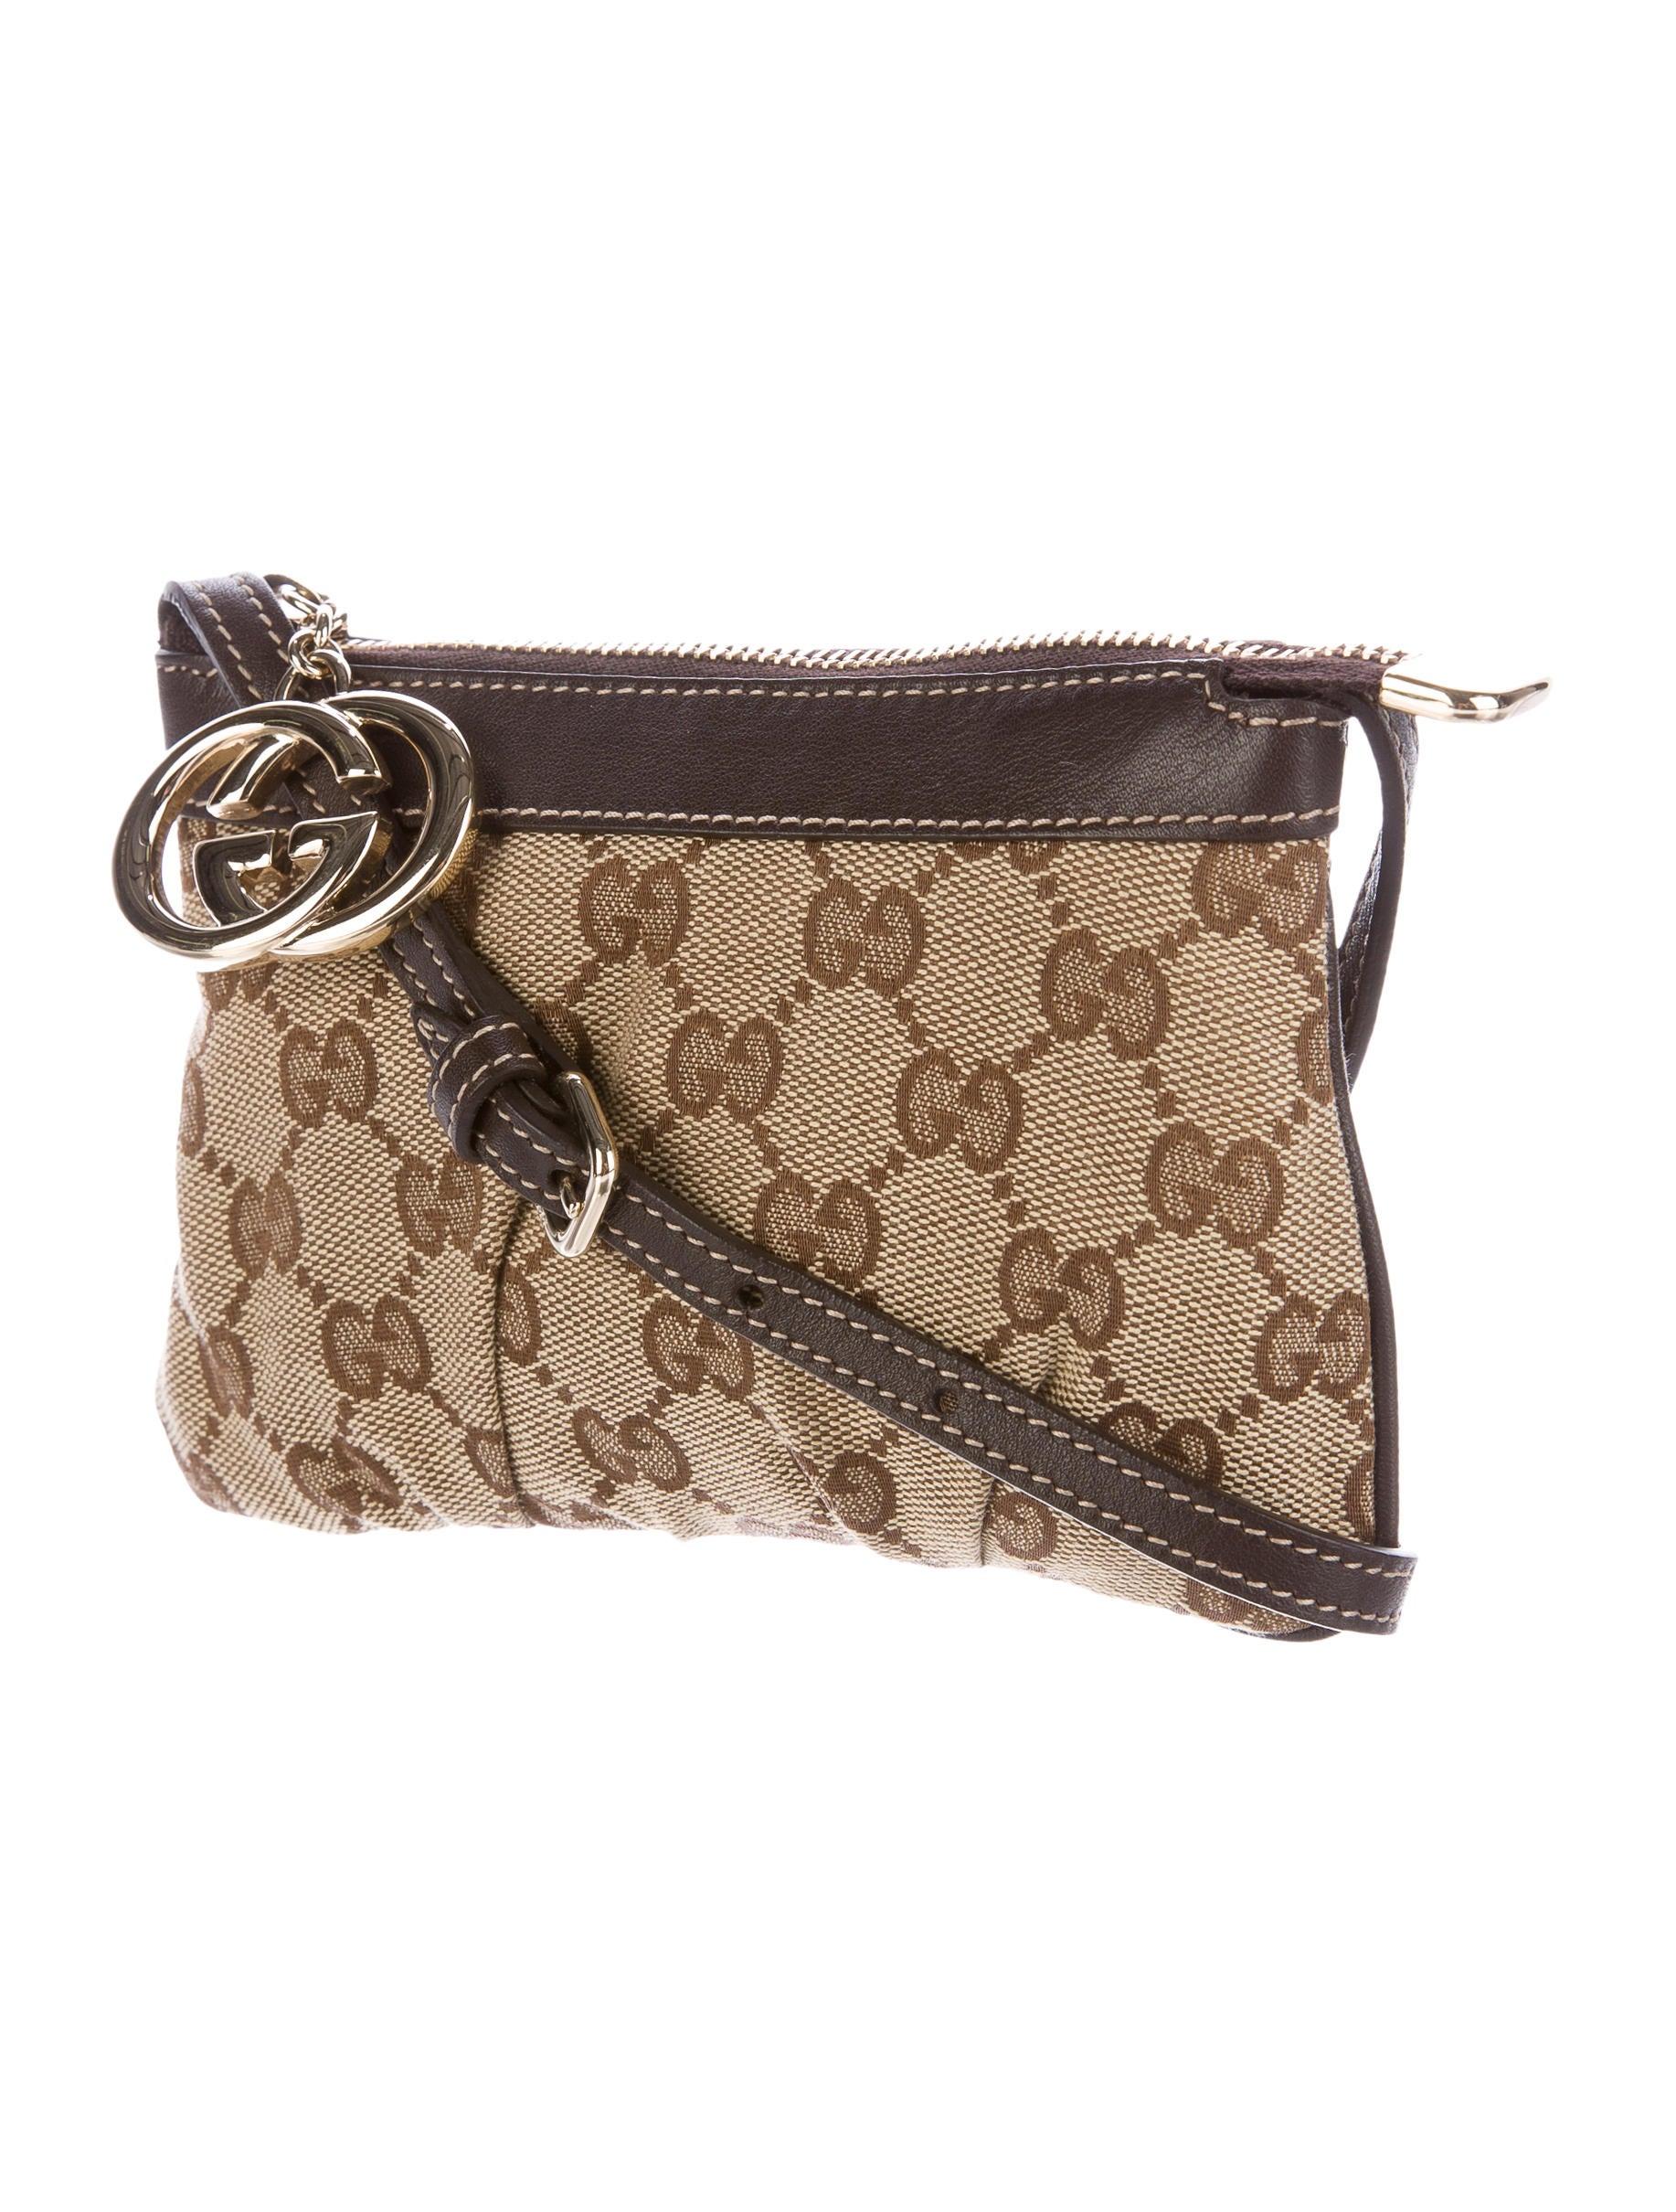 Elegant 22 Excellent Gucci Sling Bag Women | Sobatapk.com